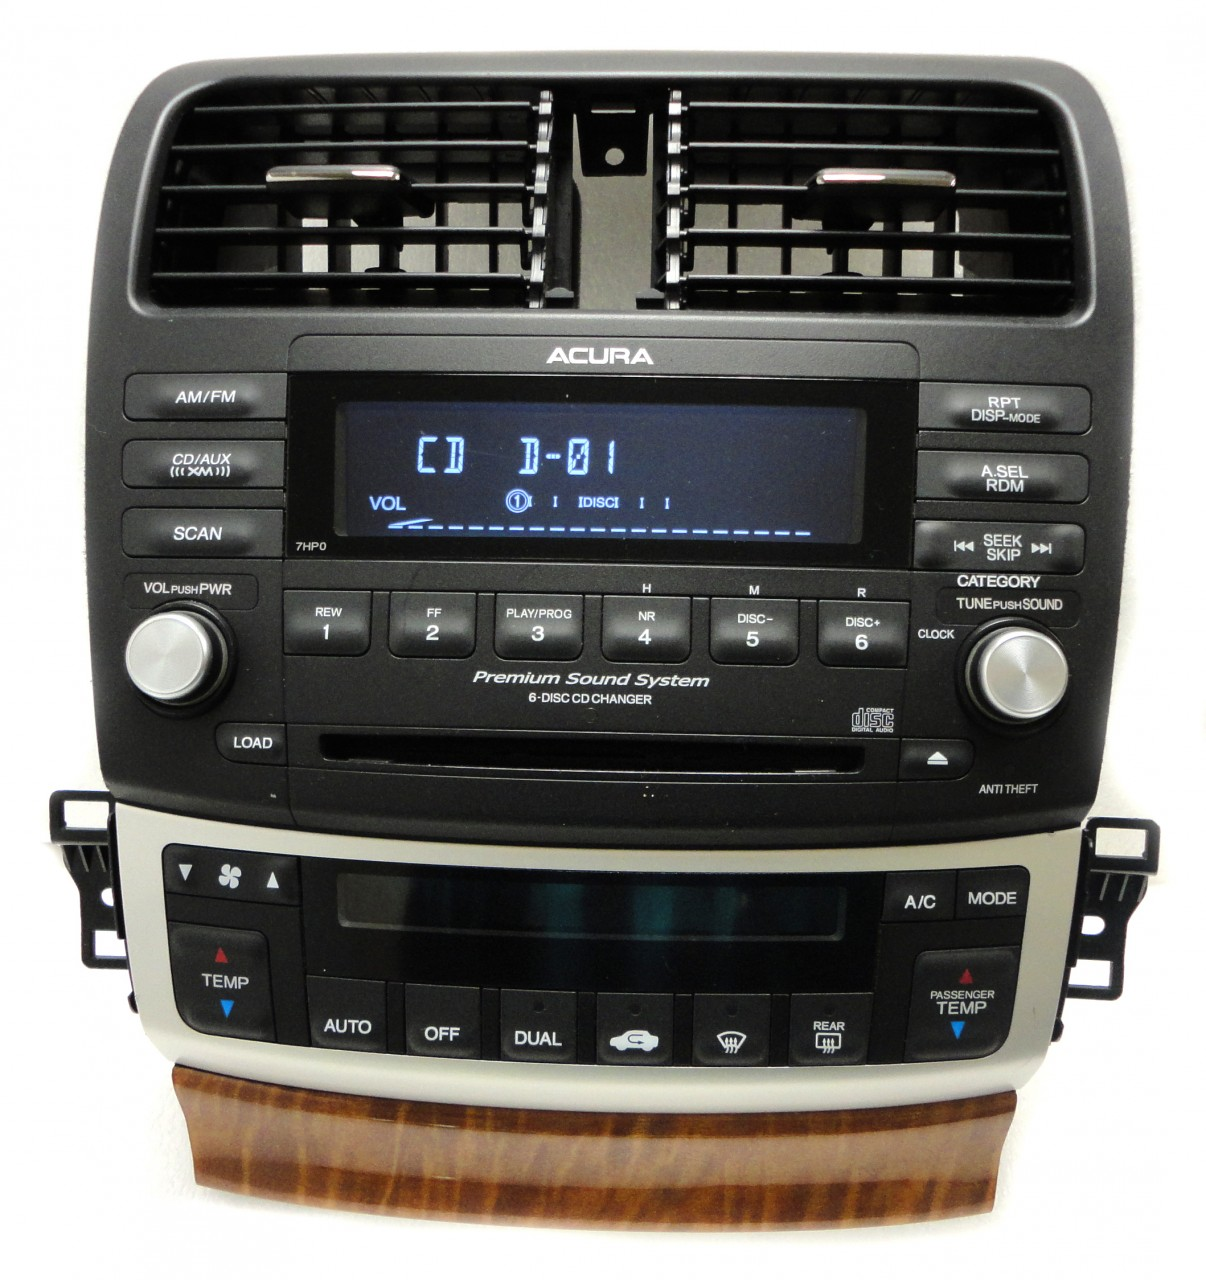 05 06 07 08 ACURA TSX Radio Stereo 6 Disc Changer CD